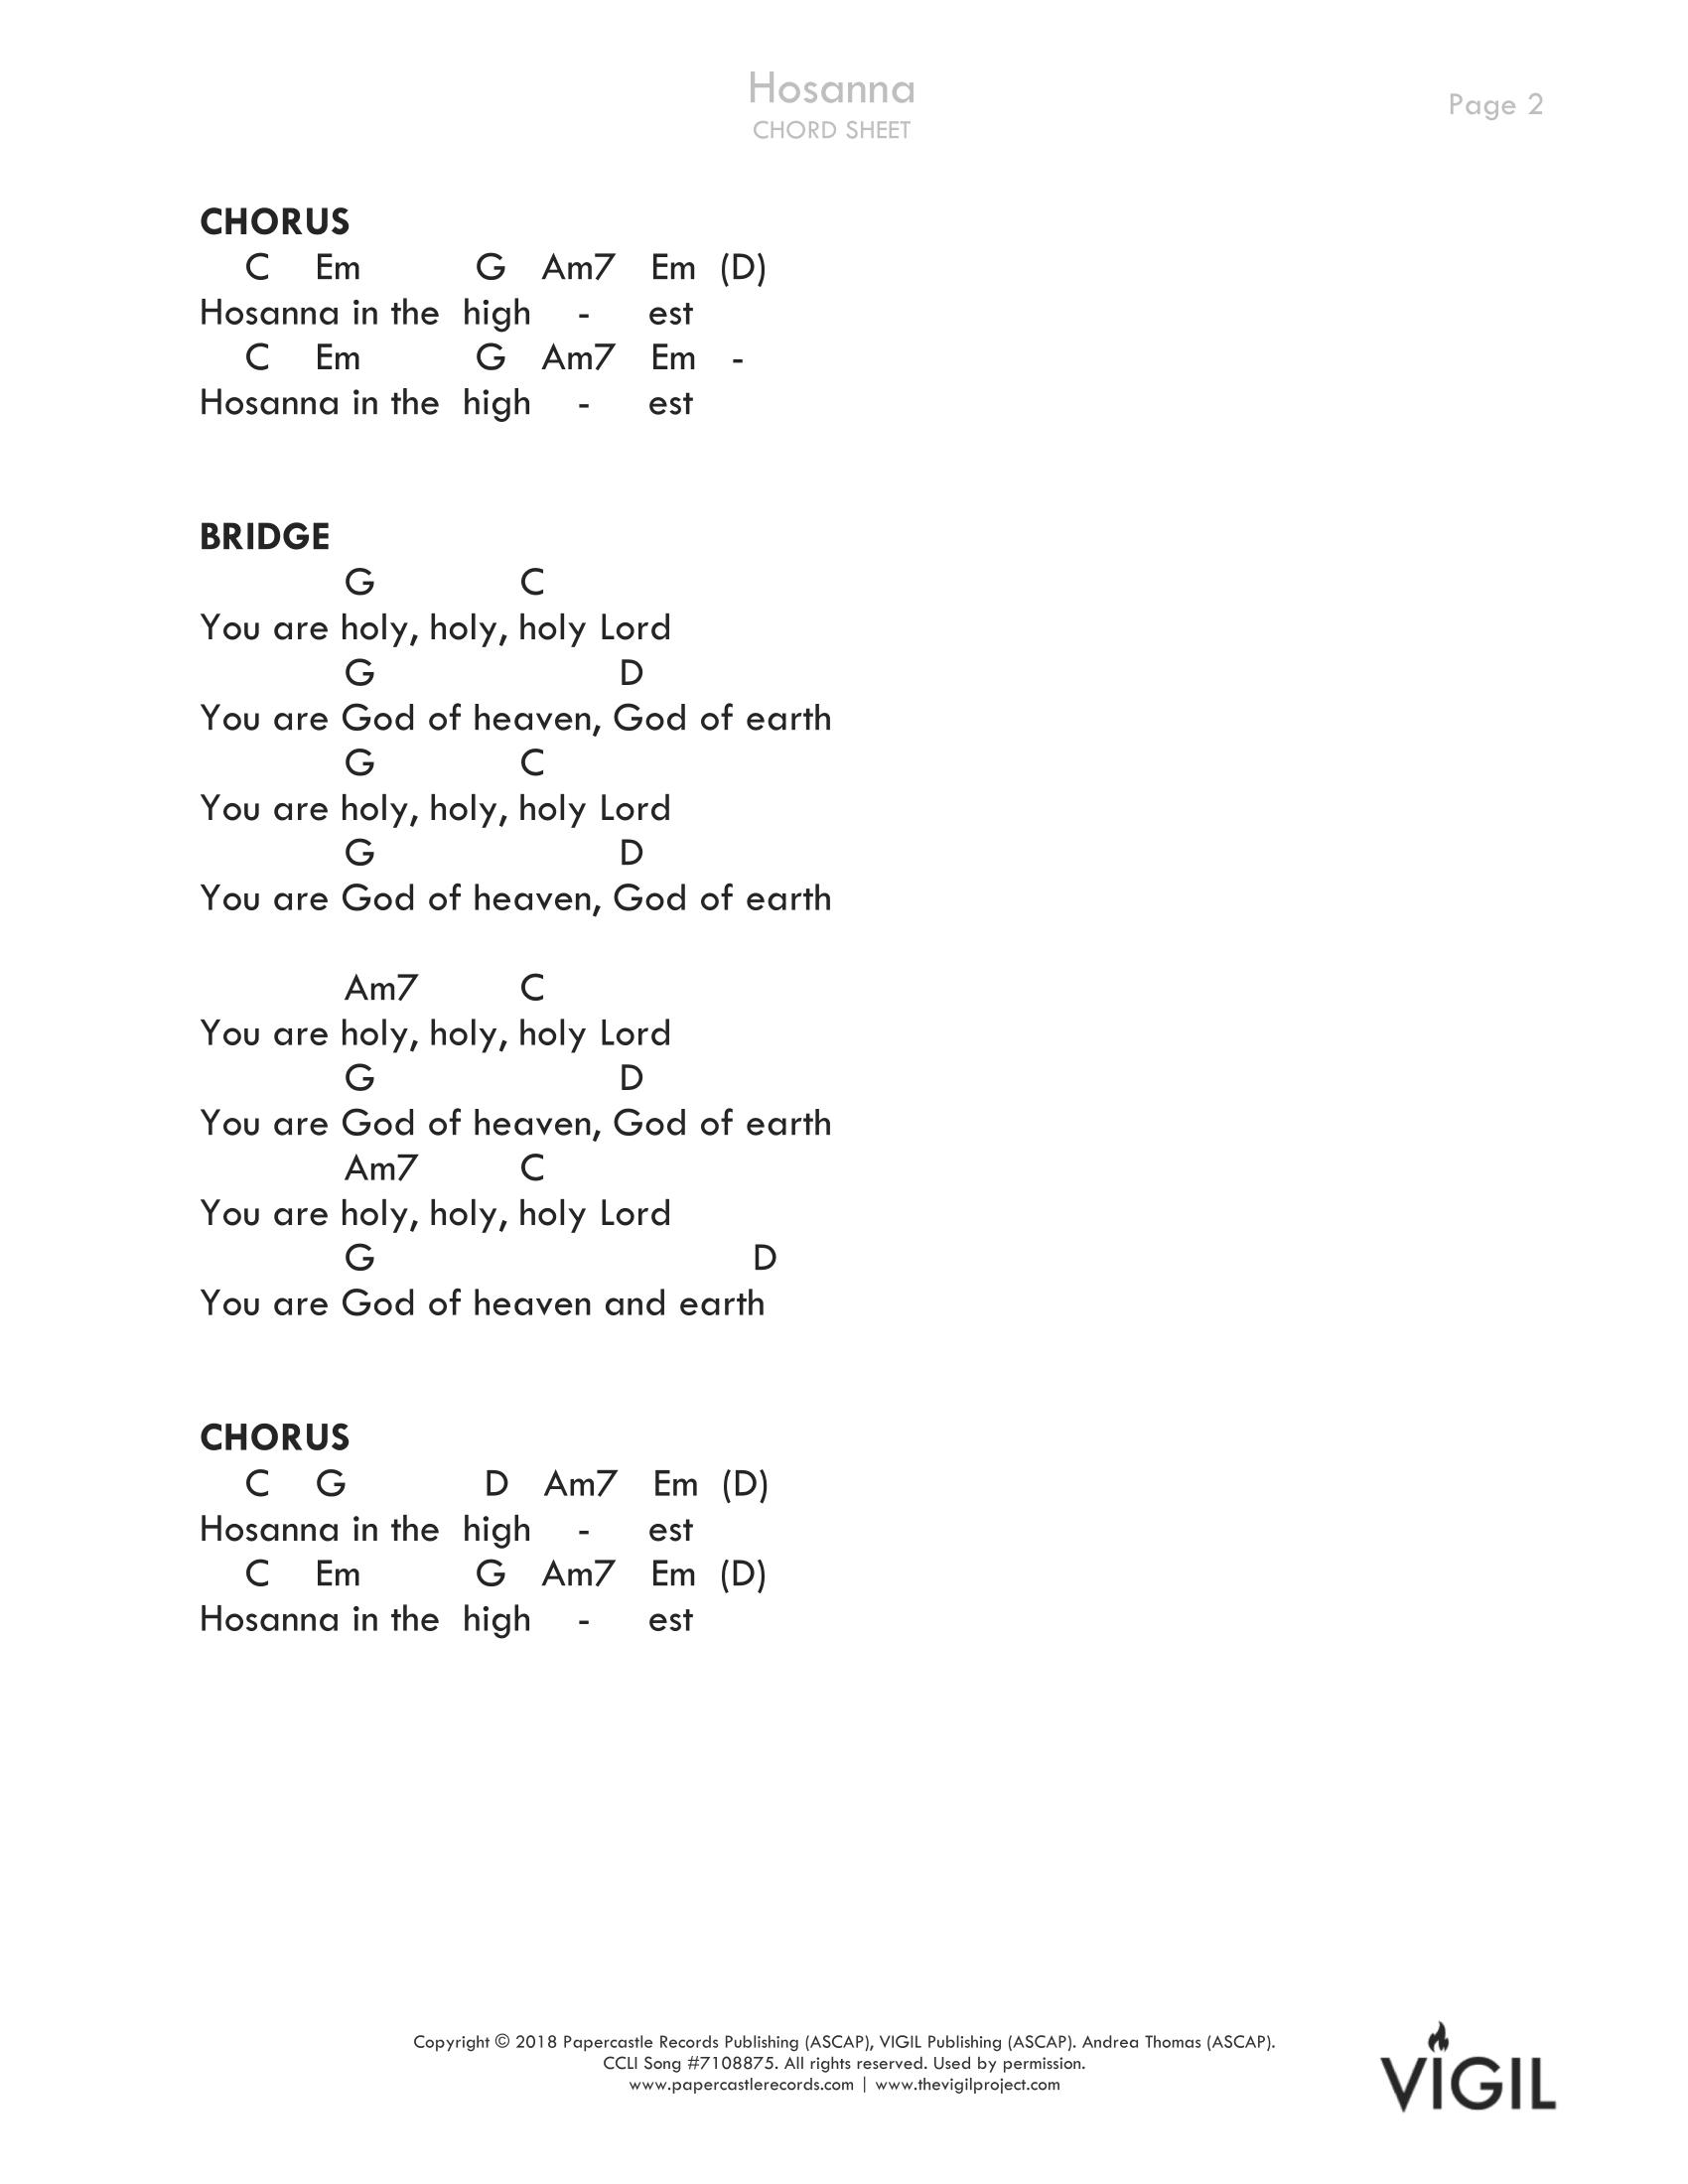 Hosanna-CHORD+SHEET+(G+Major)-2.png